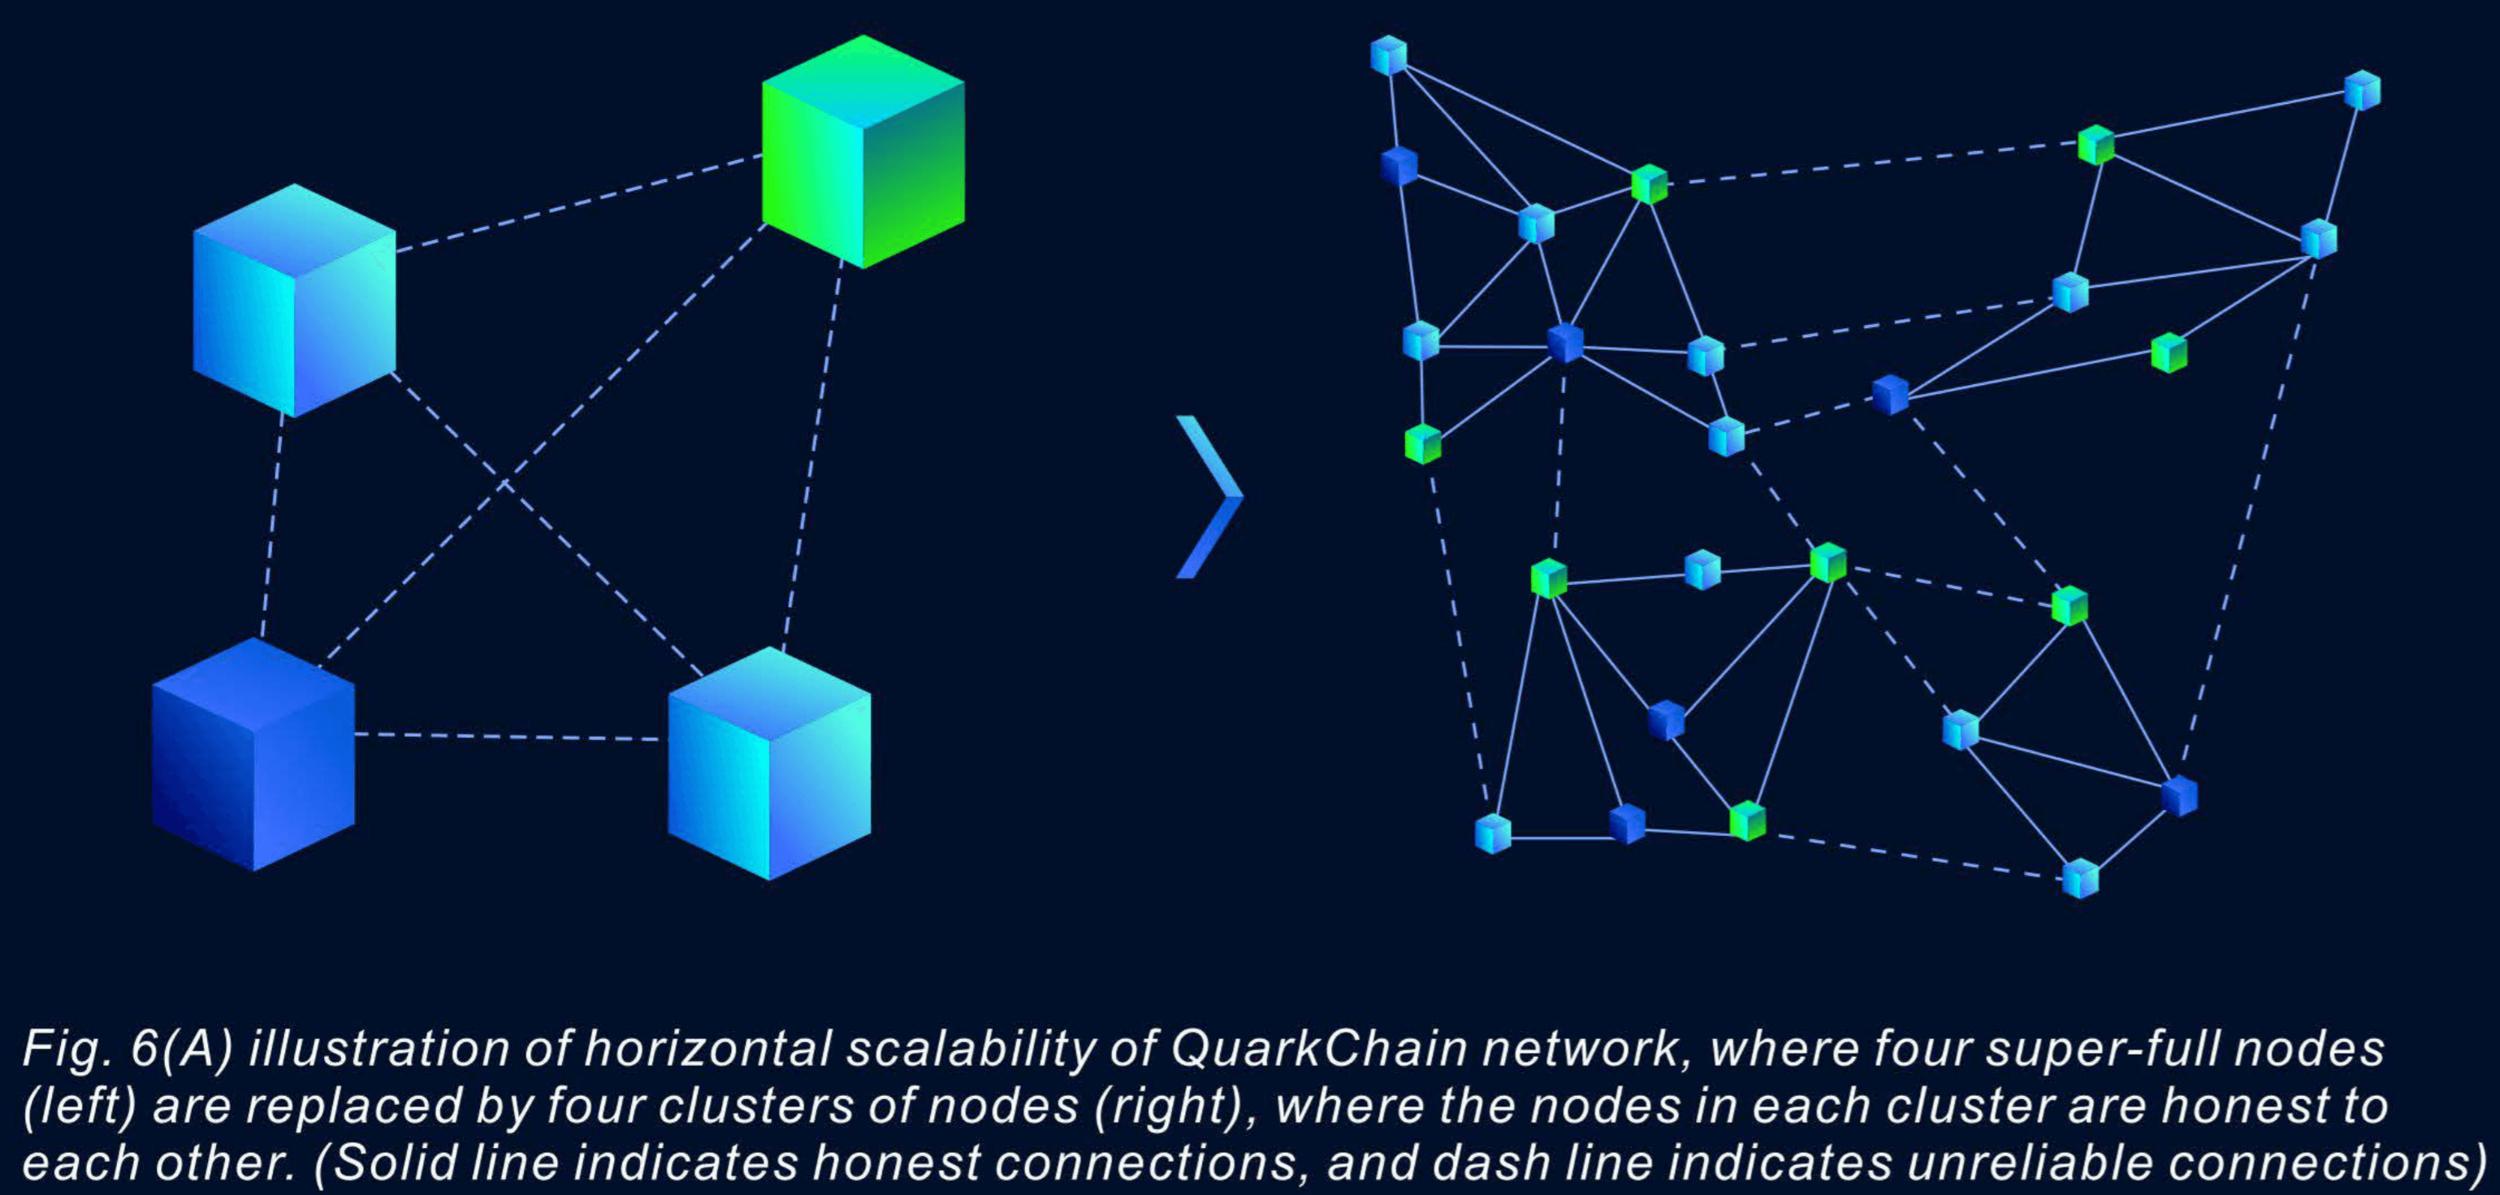 QuarkChain_super_node_cluster_decentralization_antaso_mining.png